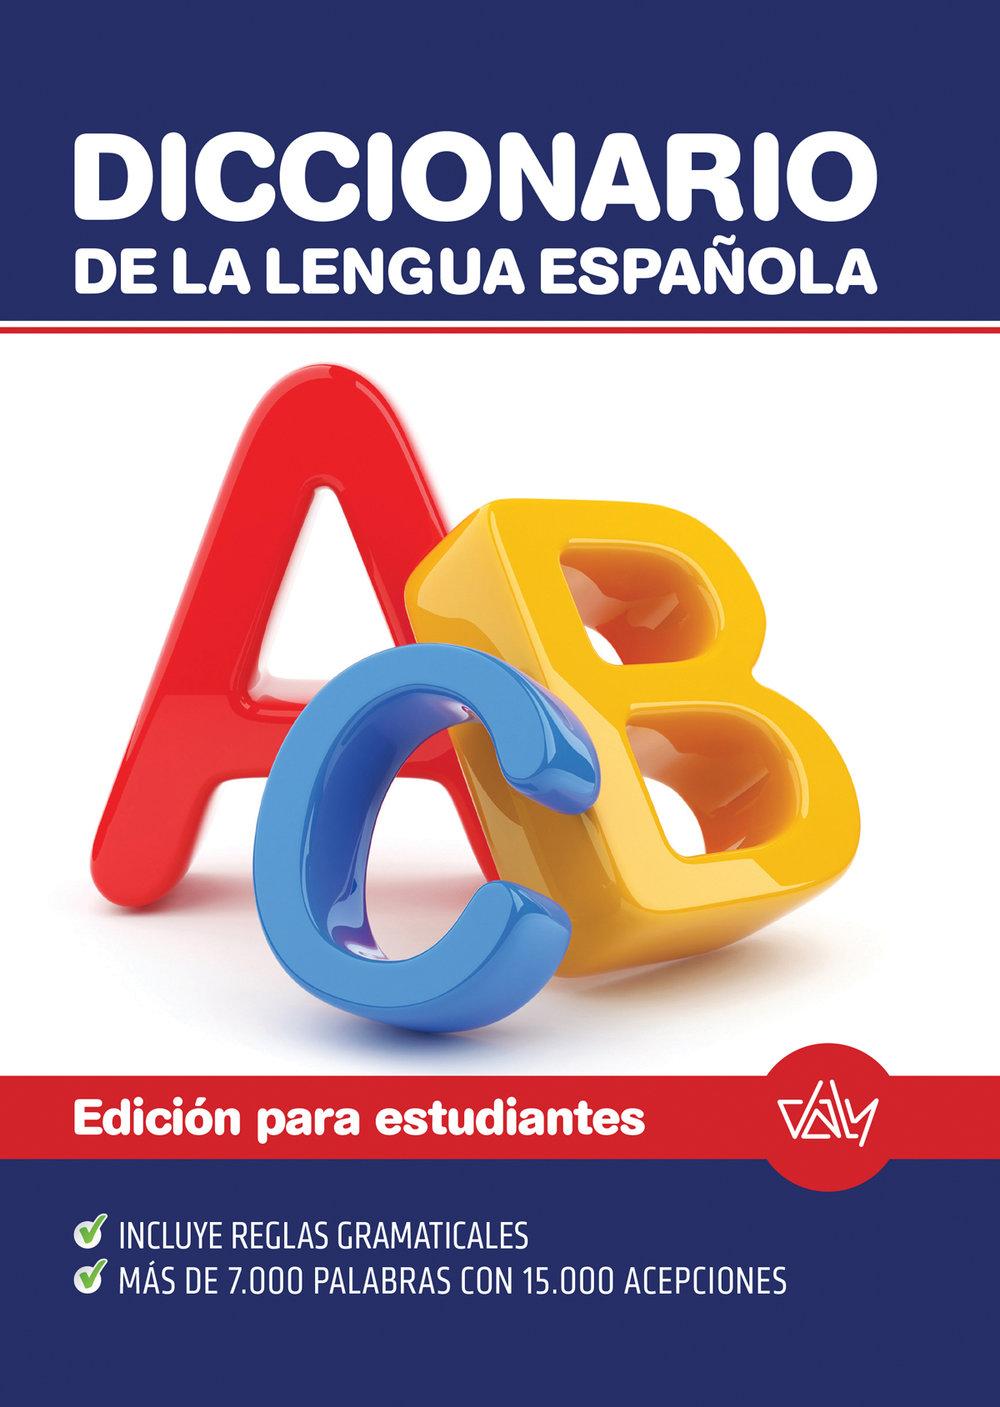 PORTADA-DICCIONARIO-LENGUA-ESPAÑOLA_WEB.jpg